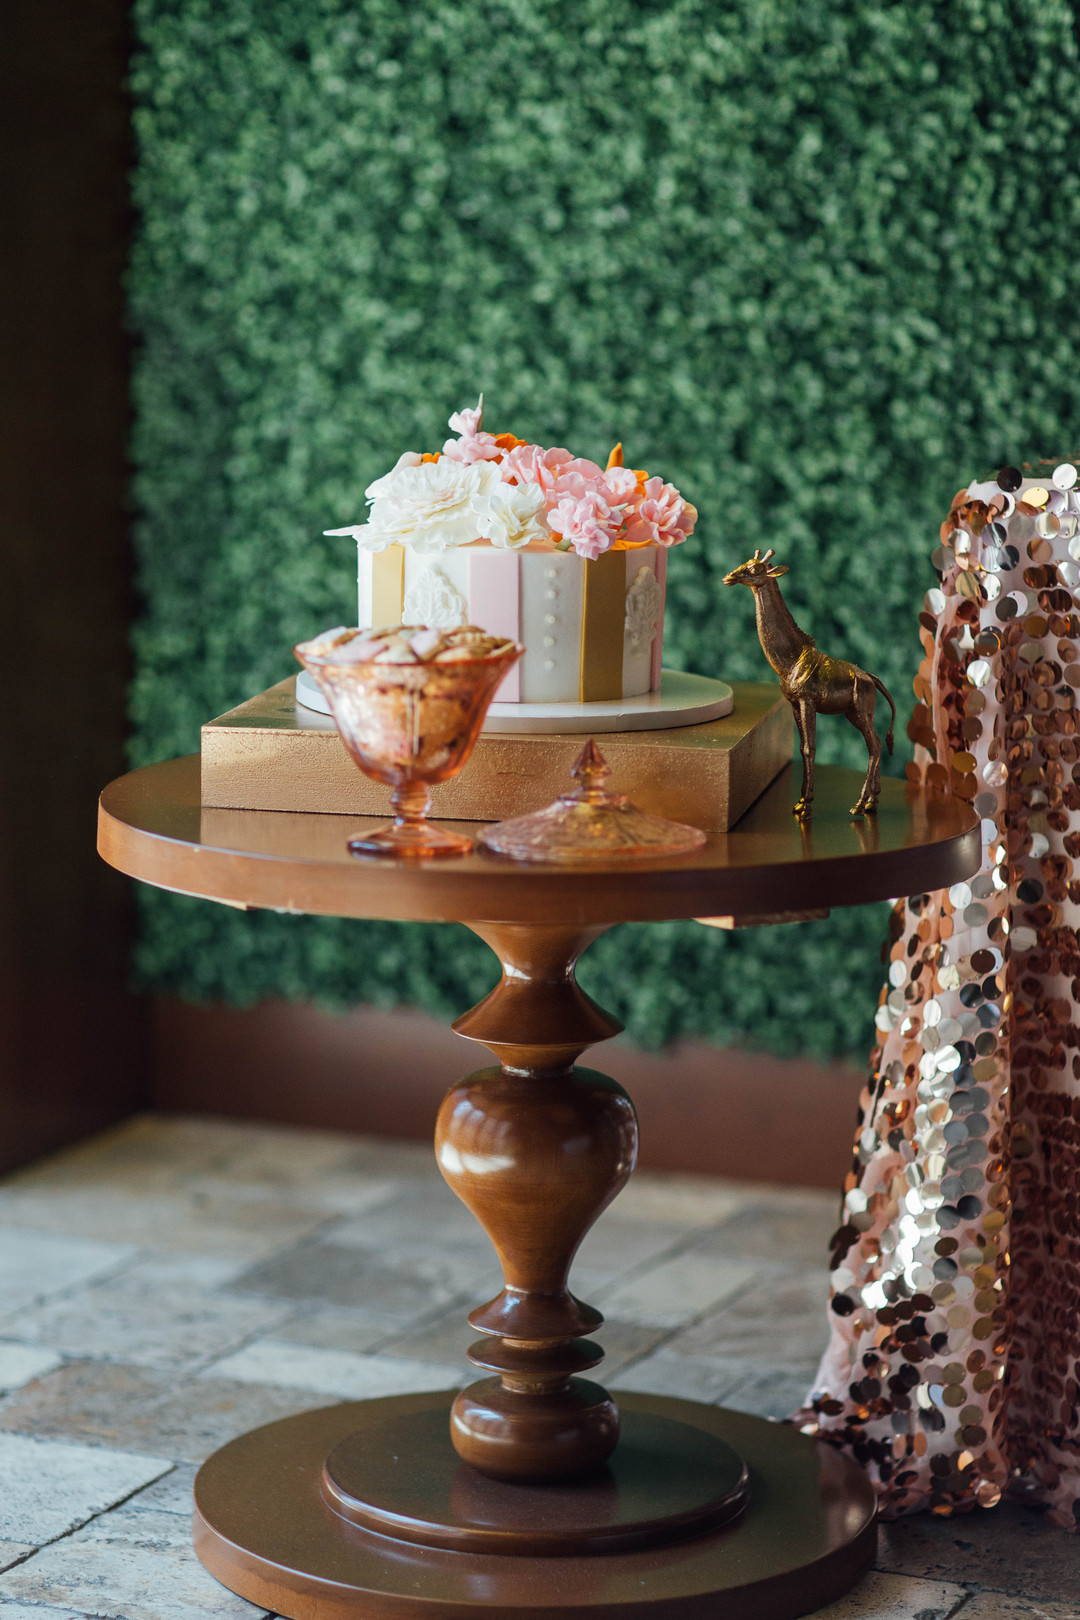 Terrific G Baby Shower Cake Pink G Baby Shower Favors Circus Pink G Dessert Baby Luxe Pink G Baby Shower Dessert Table Pink baby Pink And Gold Baby Shower